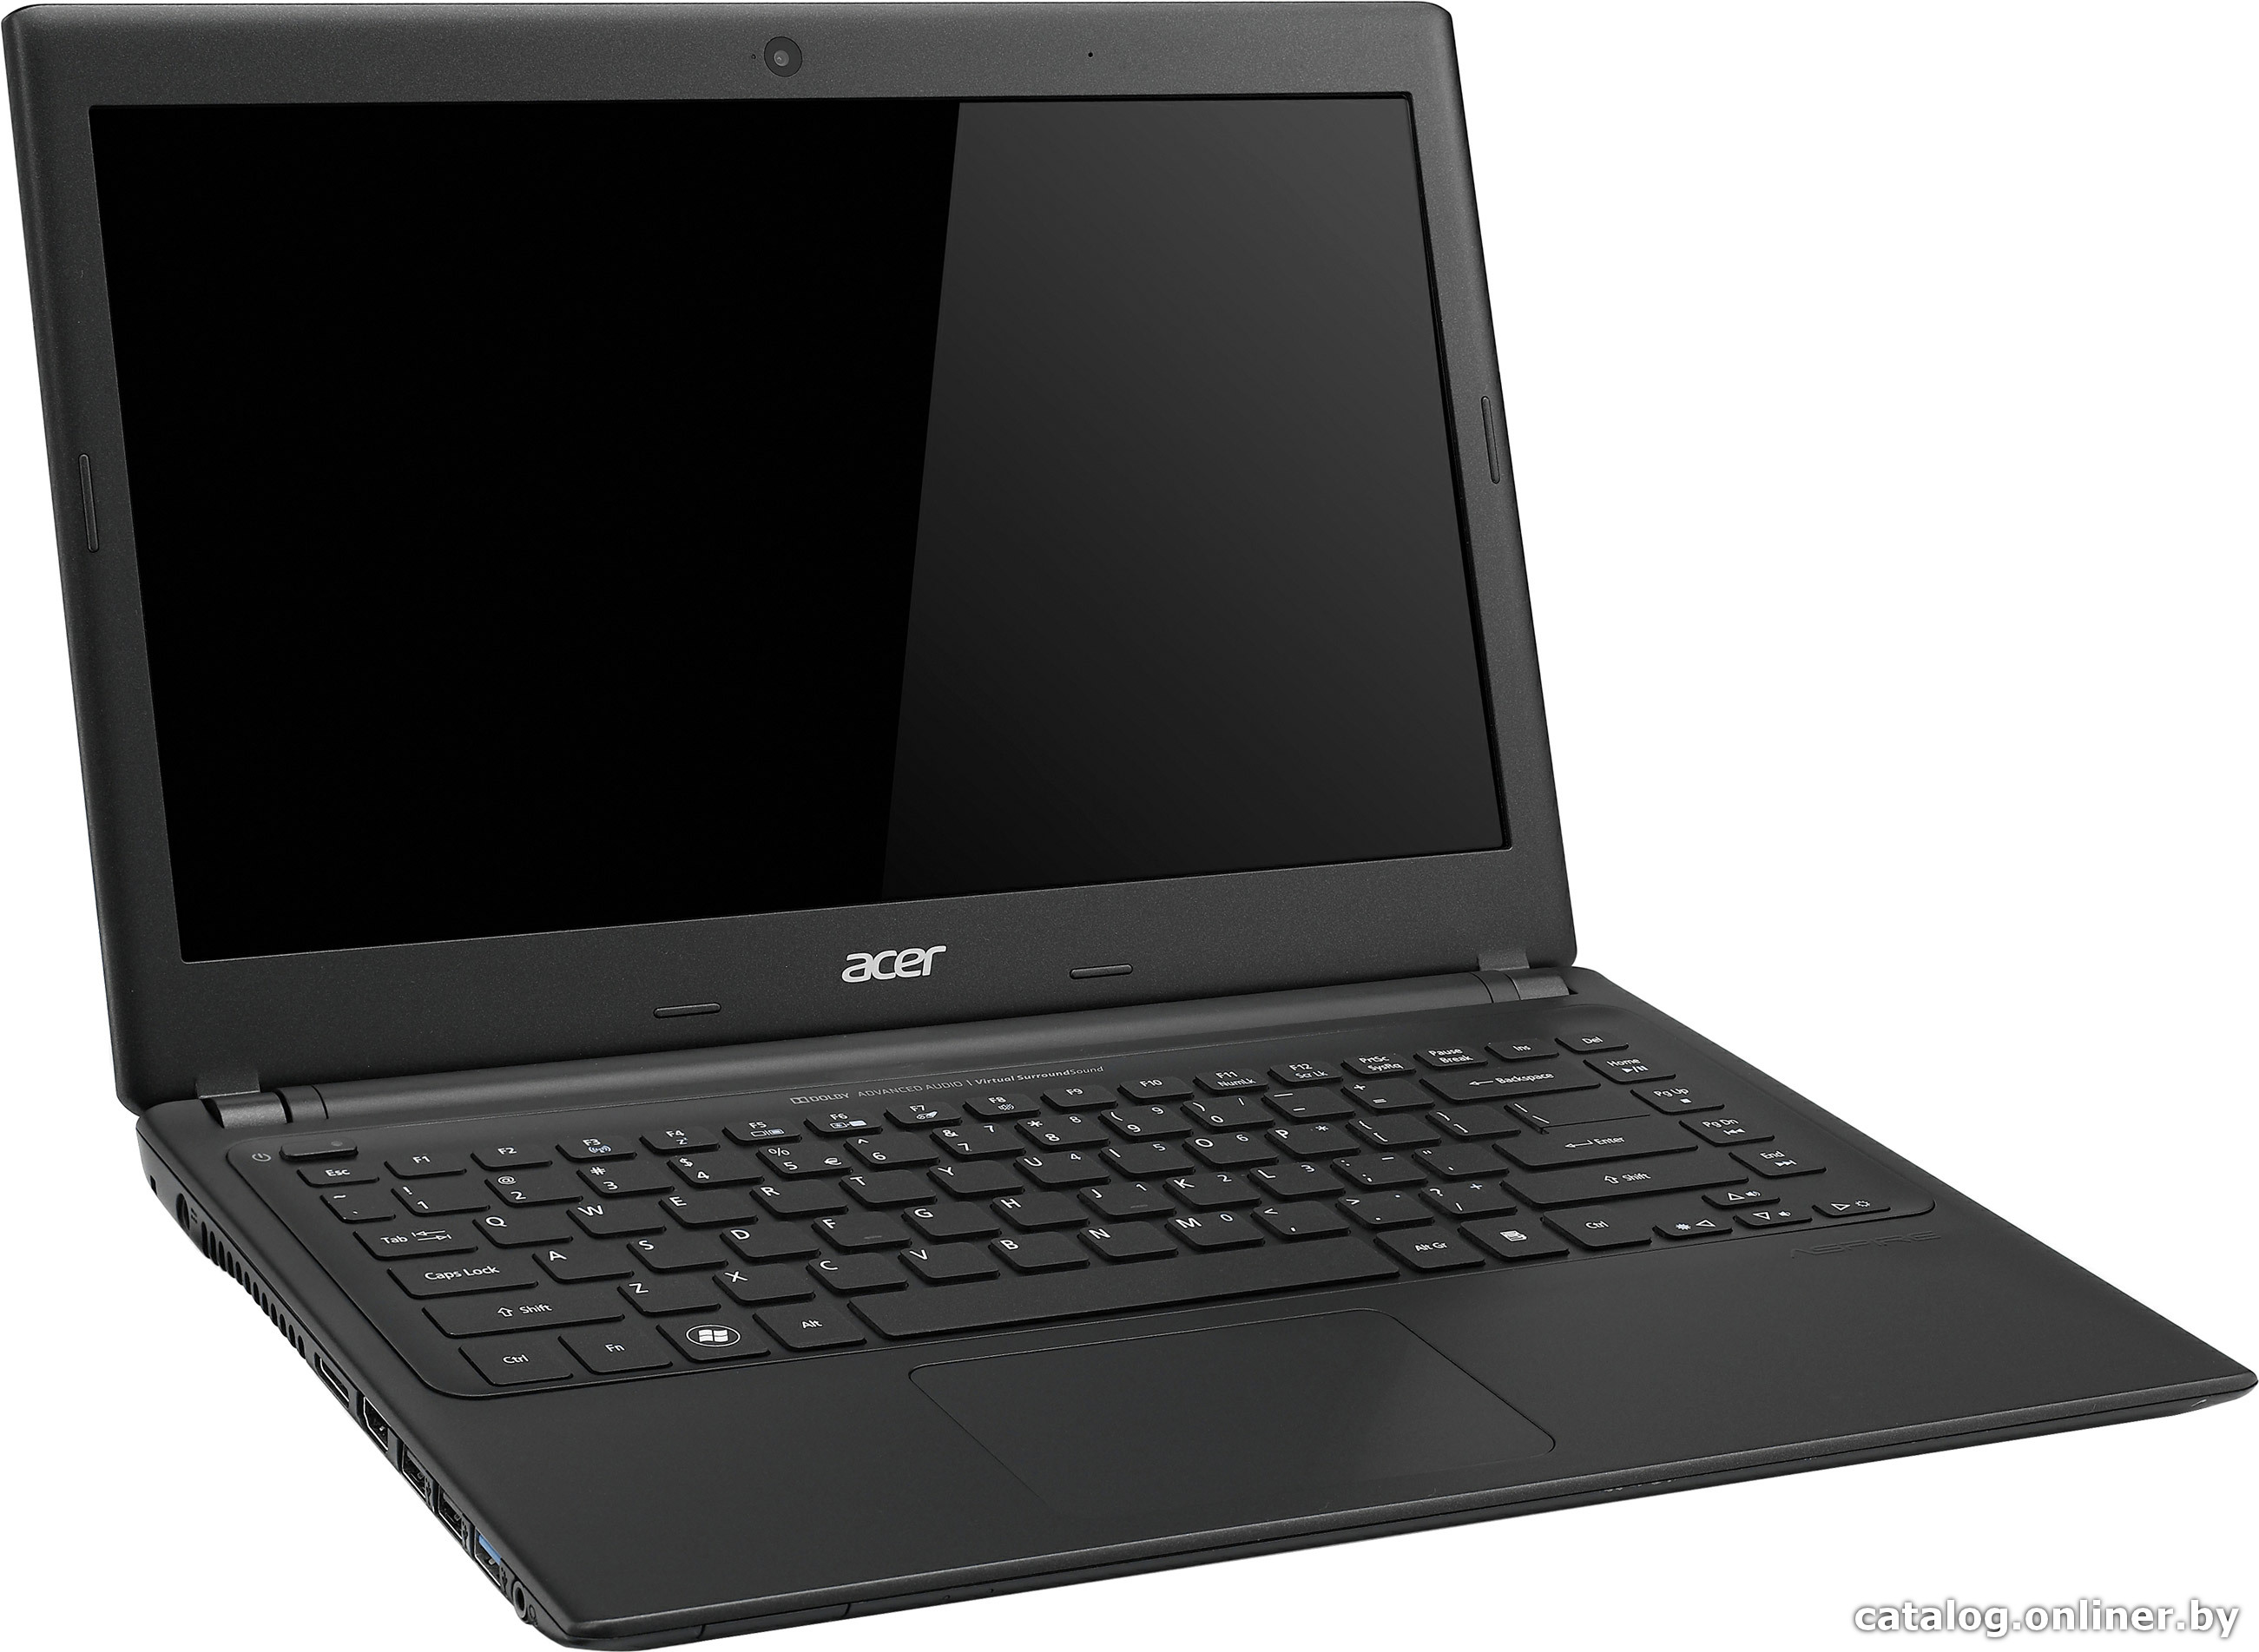 Acer Aspire V5-531G Intel USB 3.0 Drivers Windows